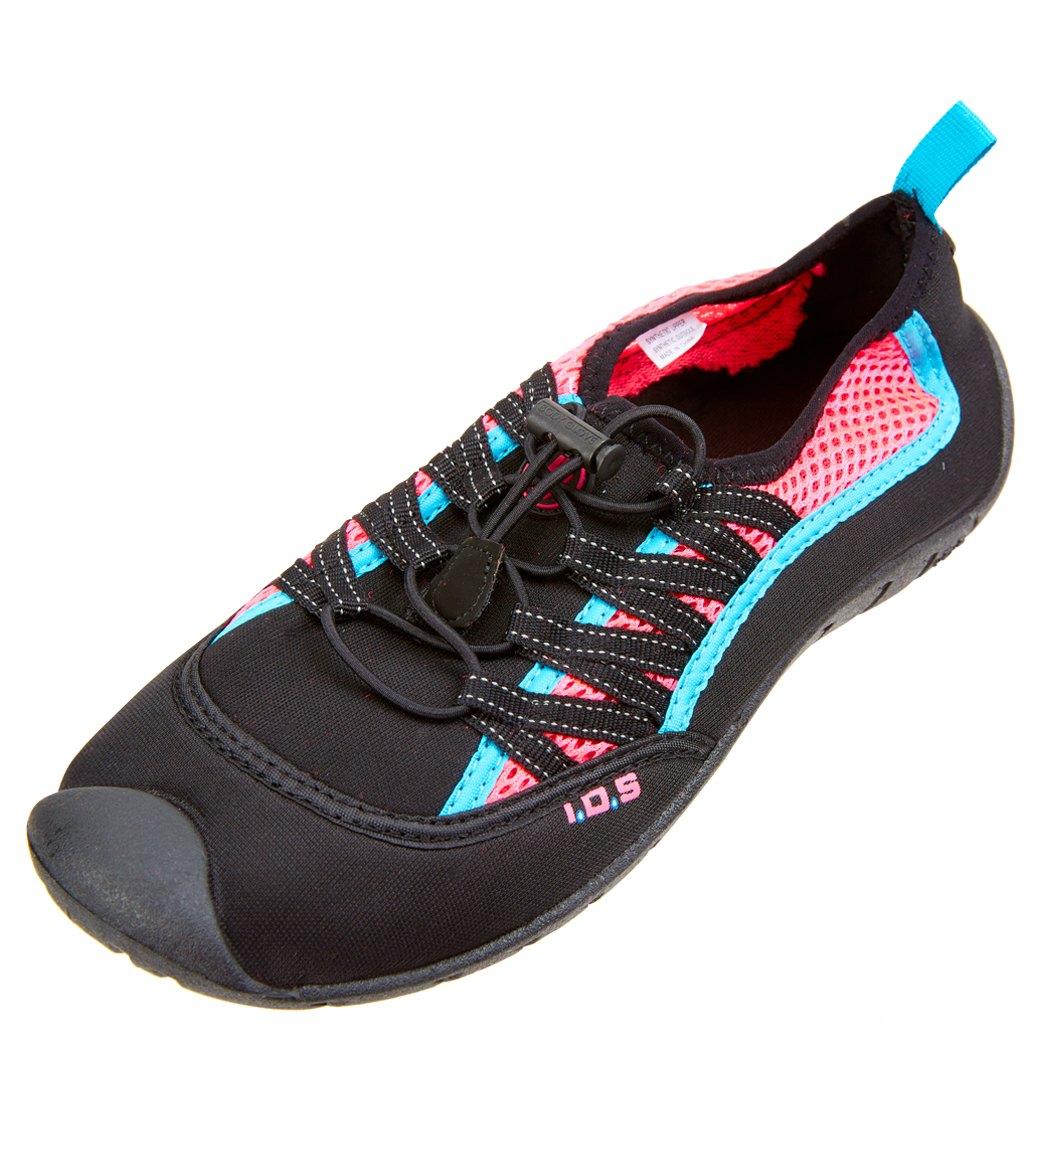 01410900e3f Body Glove Women s Sidewinder Water Shoe at SwimOutlet.com